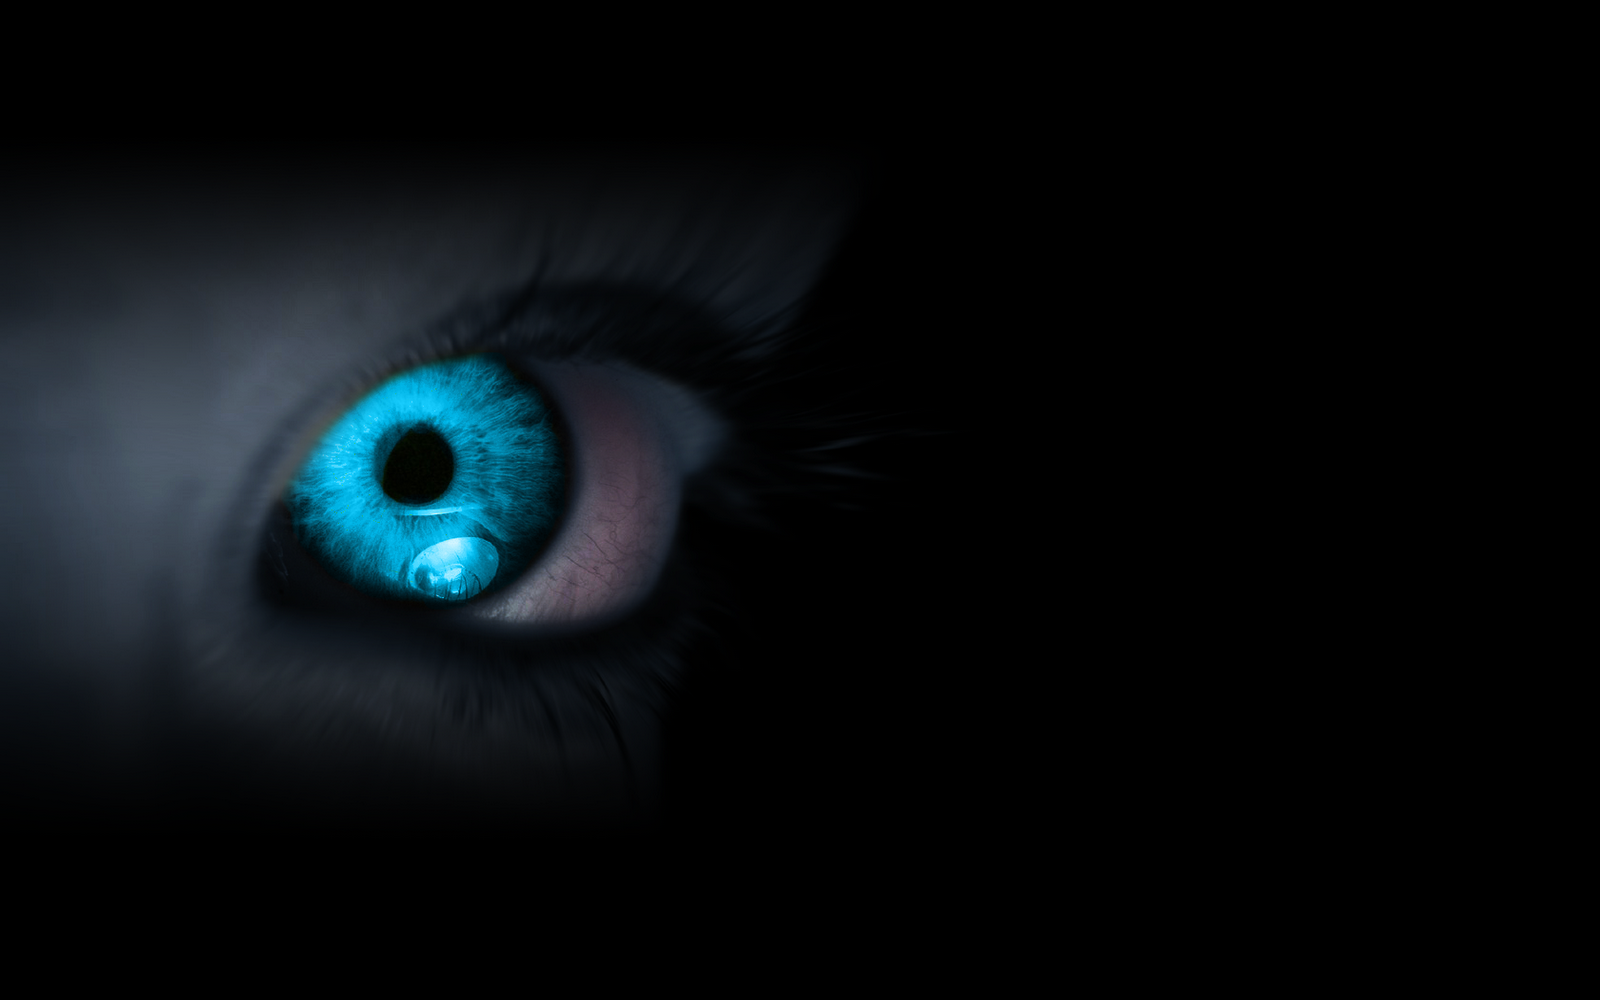 the daily desktop cool eyes 8d